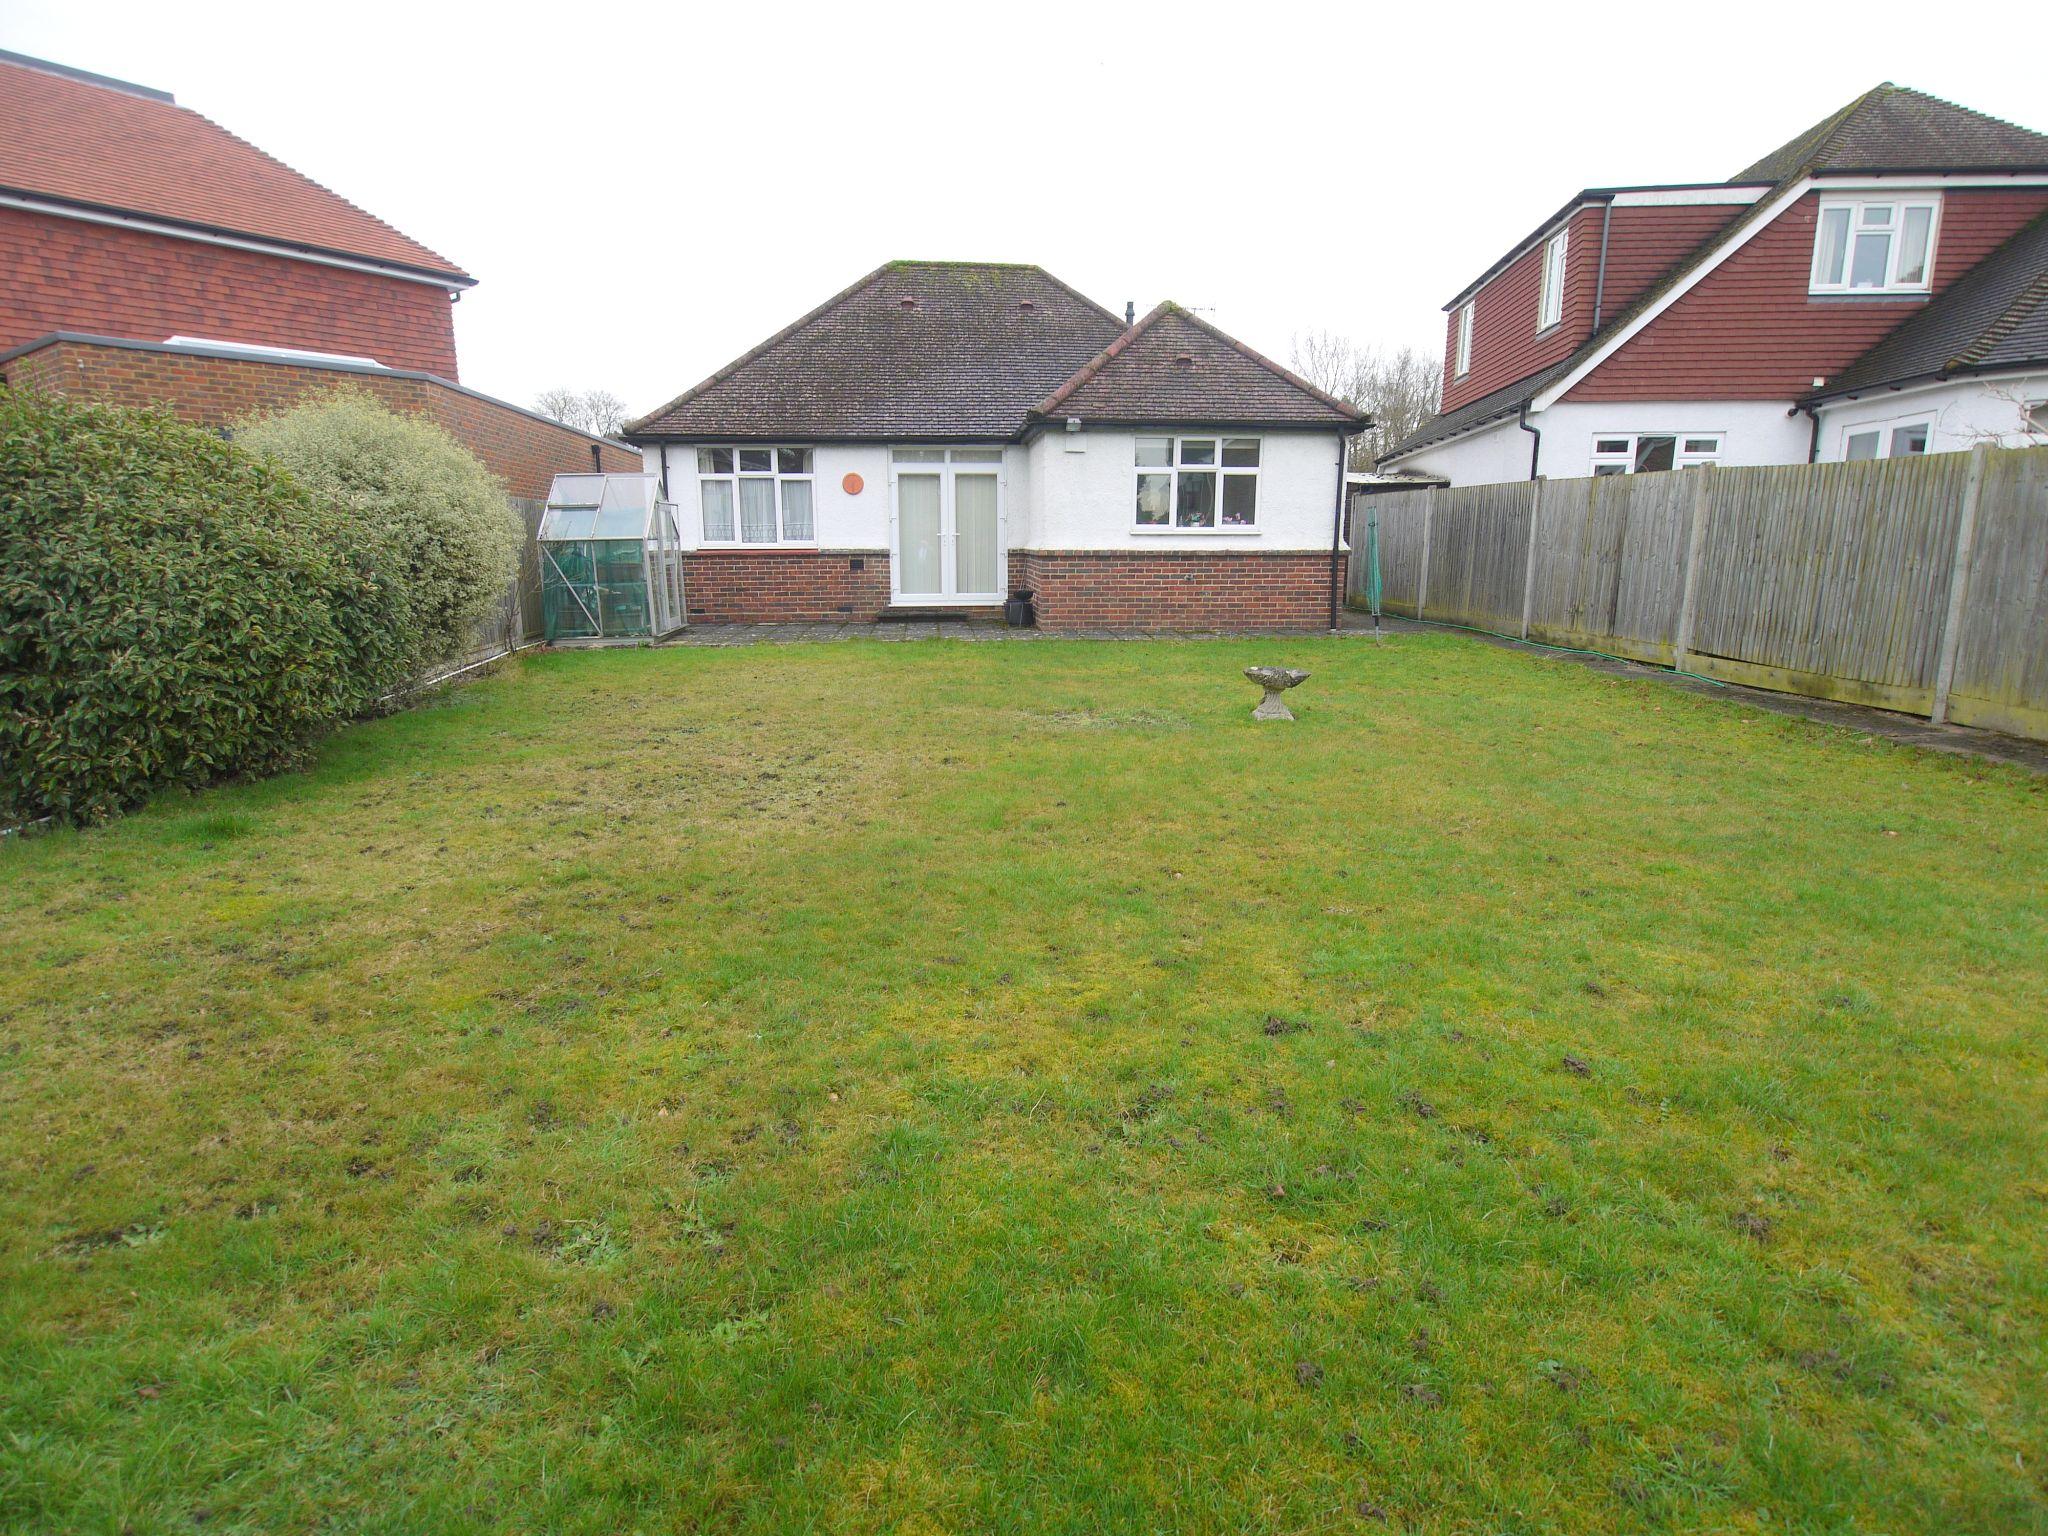 3 bedroom detached bungalow Sold in Sevenoaks - Photograph 9